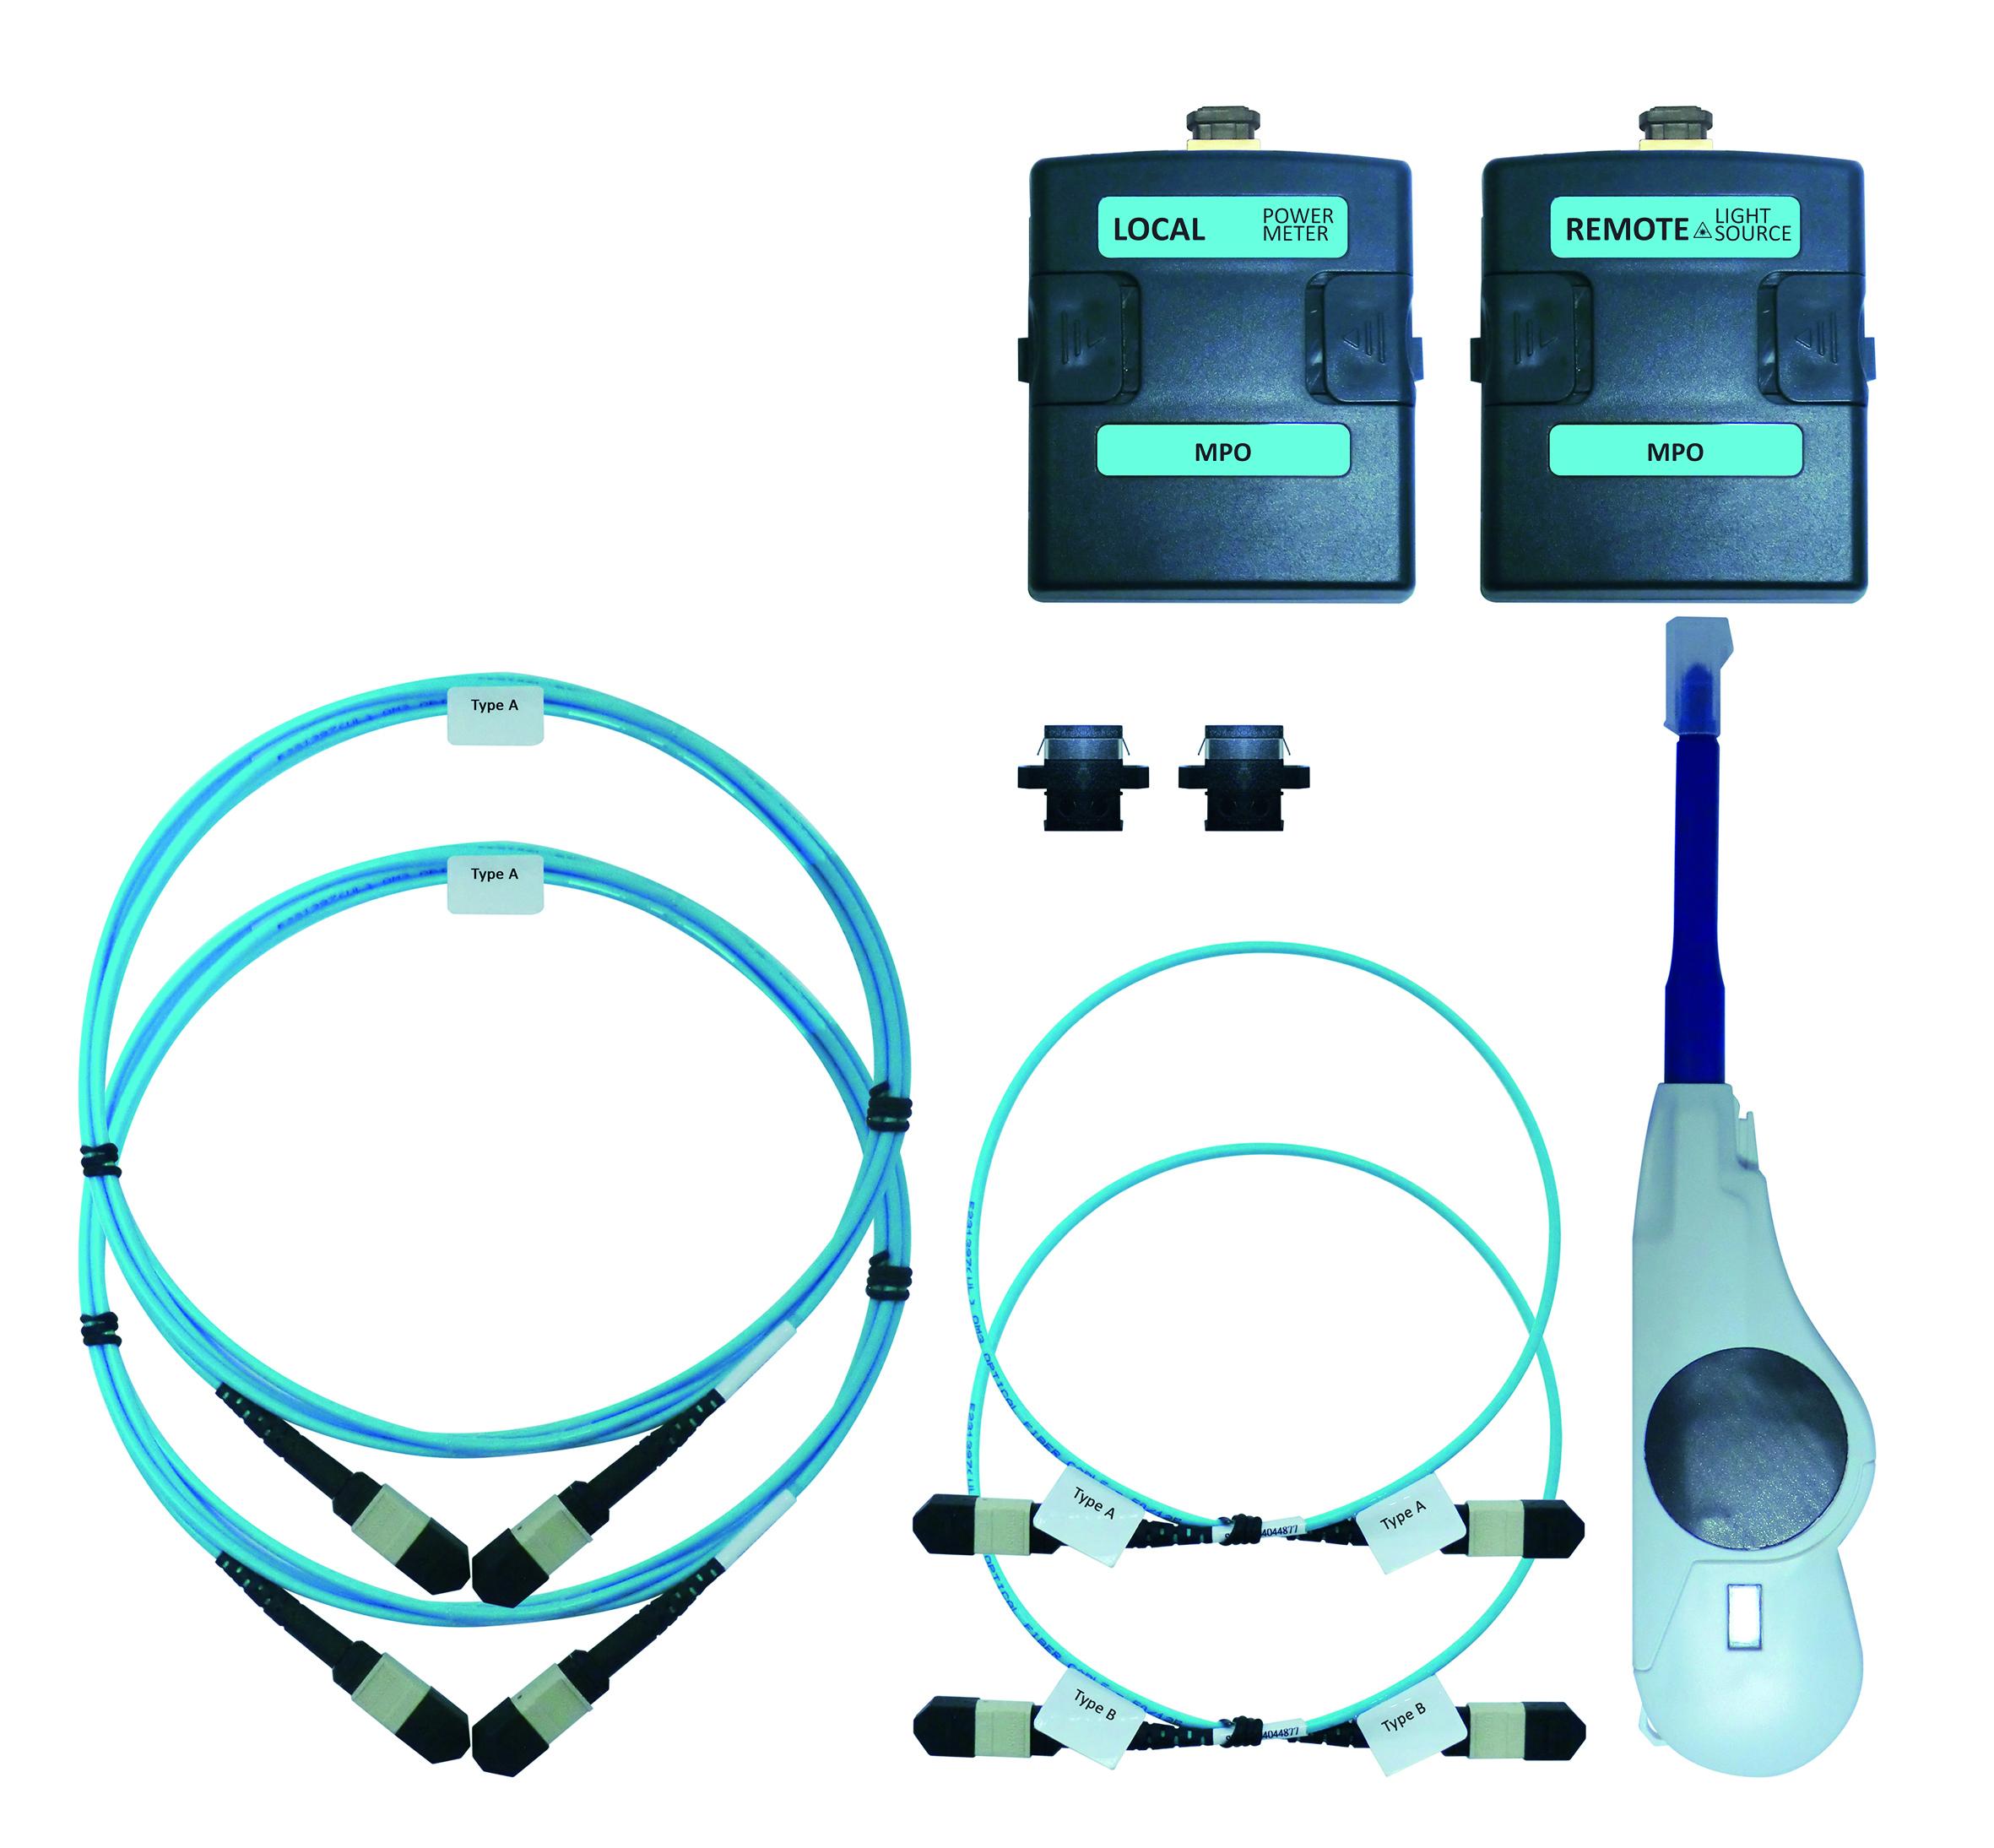 1 Stk WireXpert - MPO Multimode Test Kit für WireXpert HMSWXZMPO-